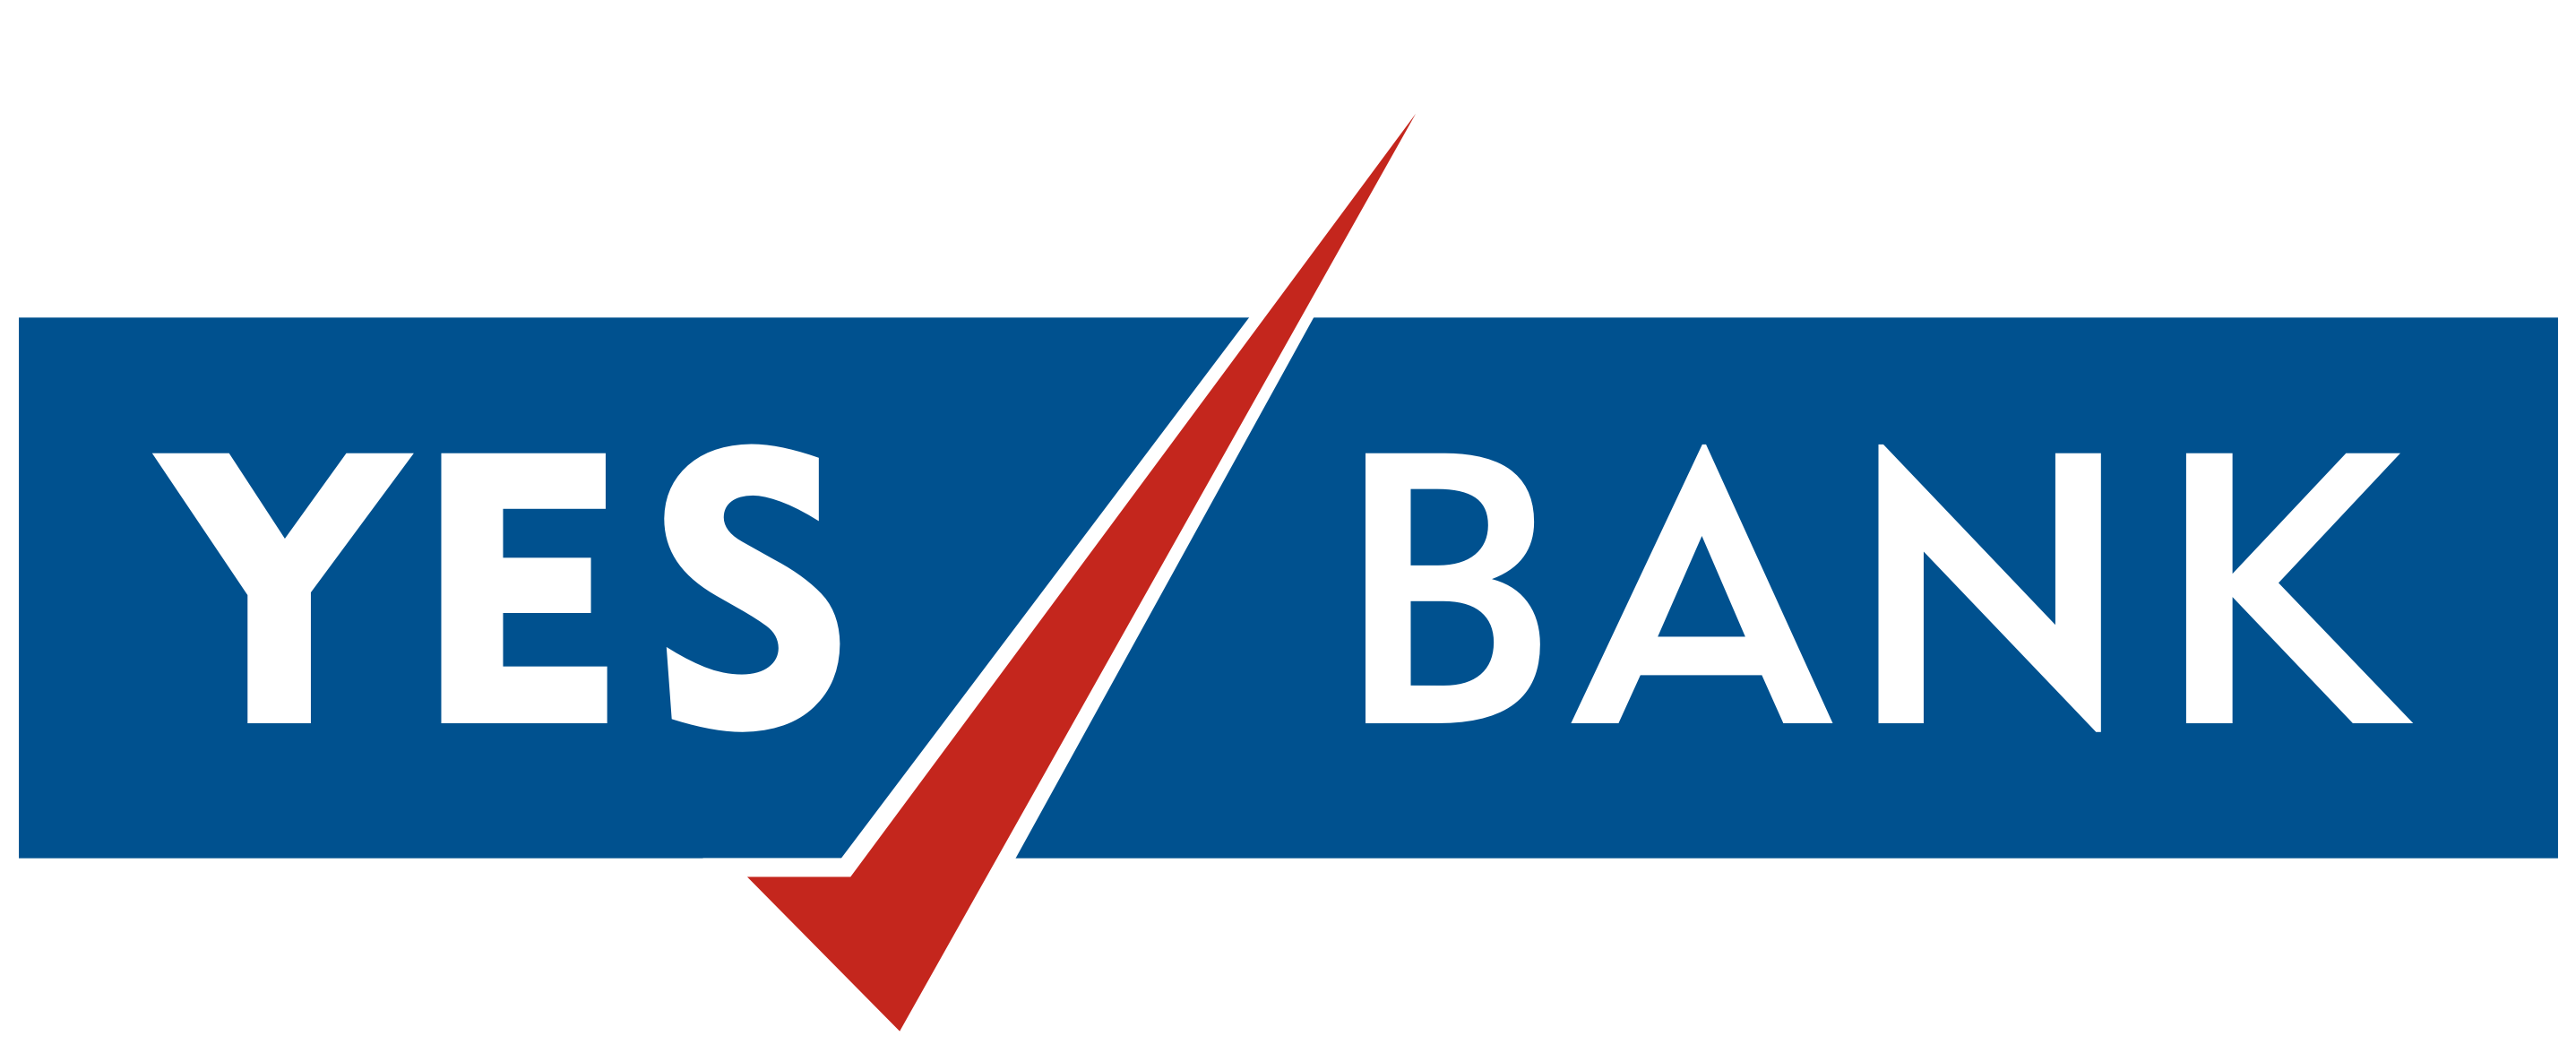 Bankorp Logo photo - 1